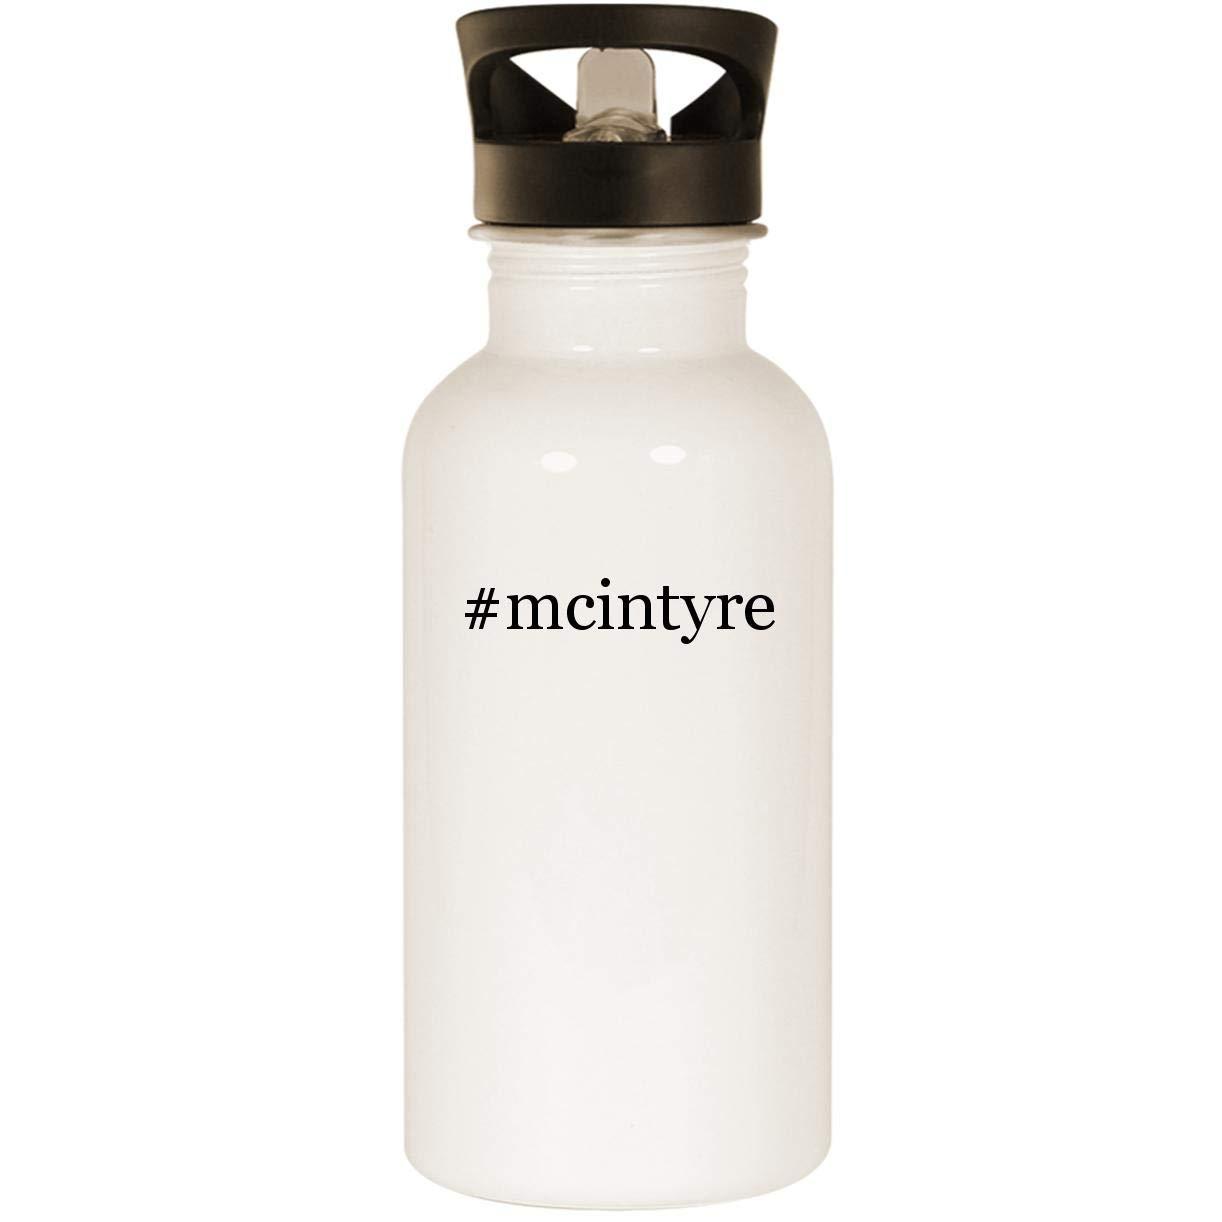 #mcintyre – ステンレススチール 20オンス ロードレディウォーターボトル ホワイト US-C-07-18-02-079858-04-26-19-26 B07GNBGWCH ホワイト